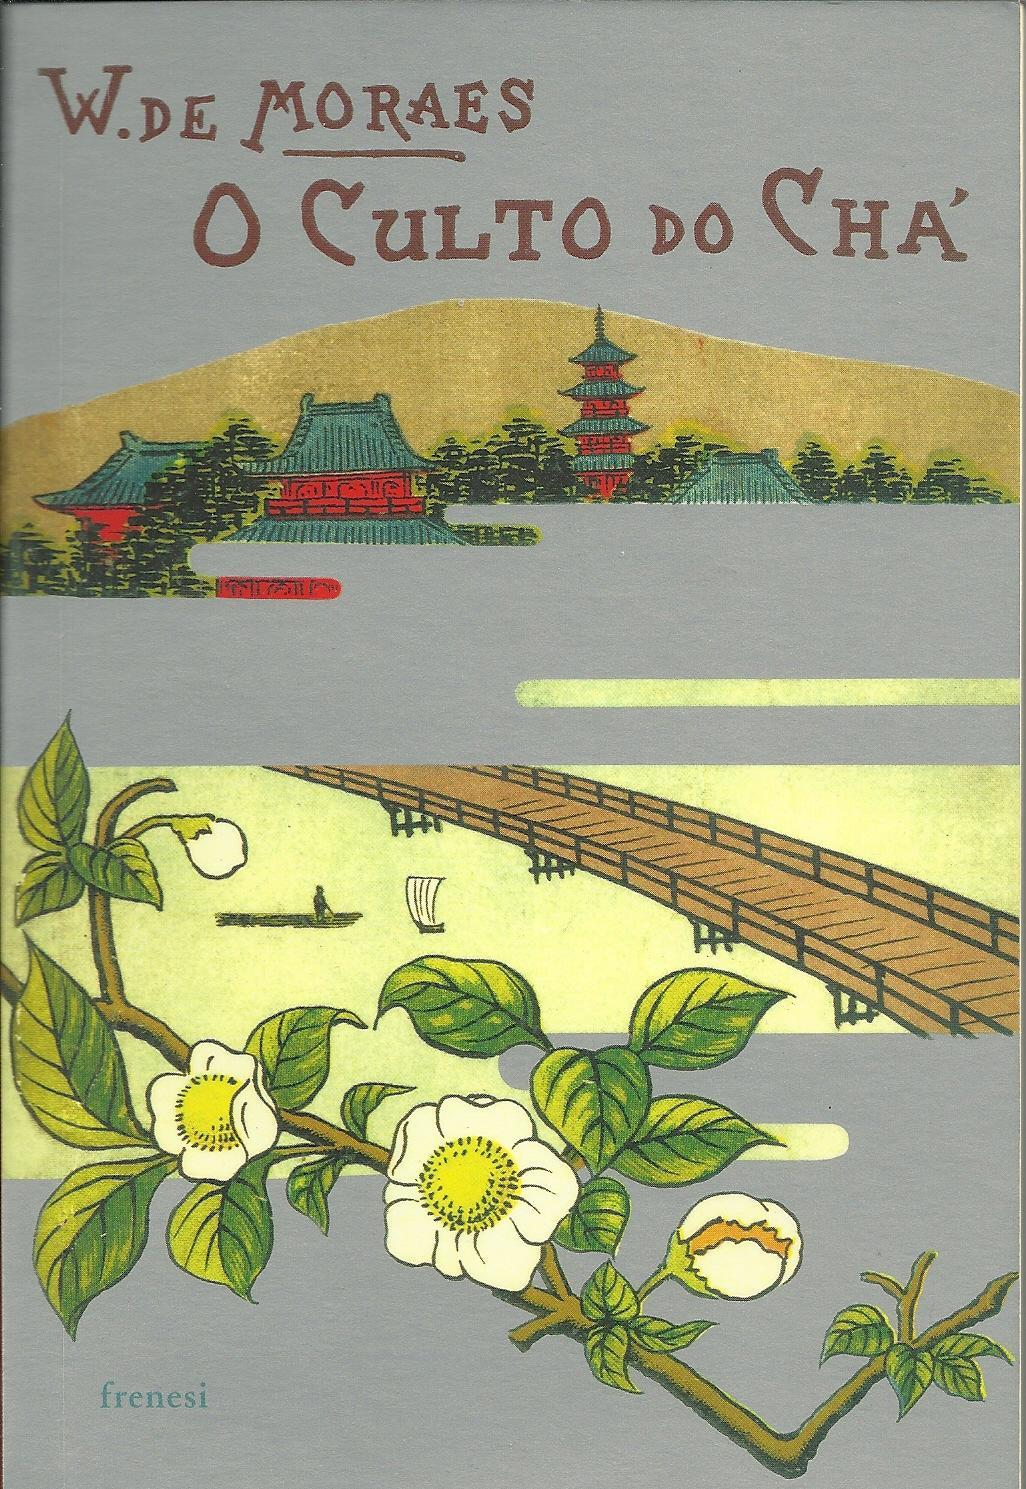 O CULTO DO CHÁ - MORAES, [José de Sousa] Wenceslau de (1854-1929)